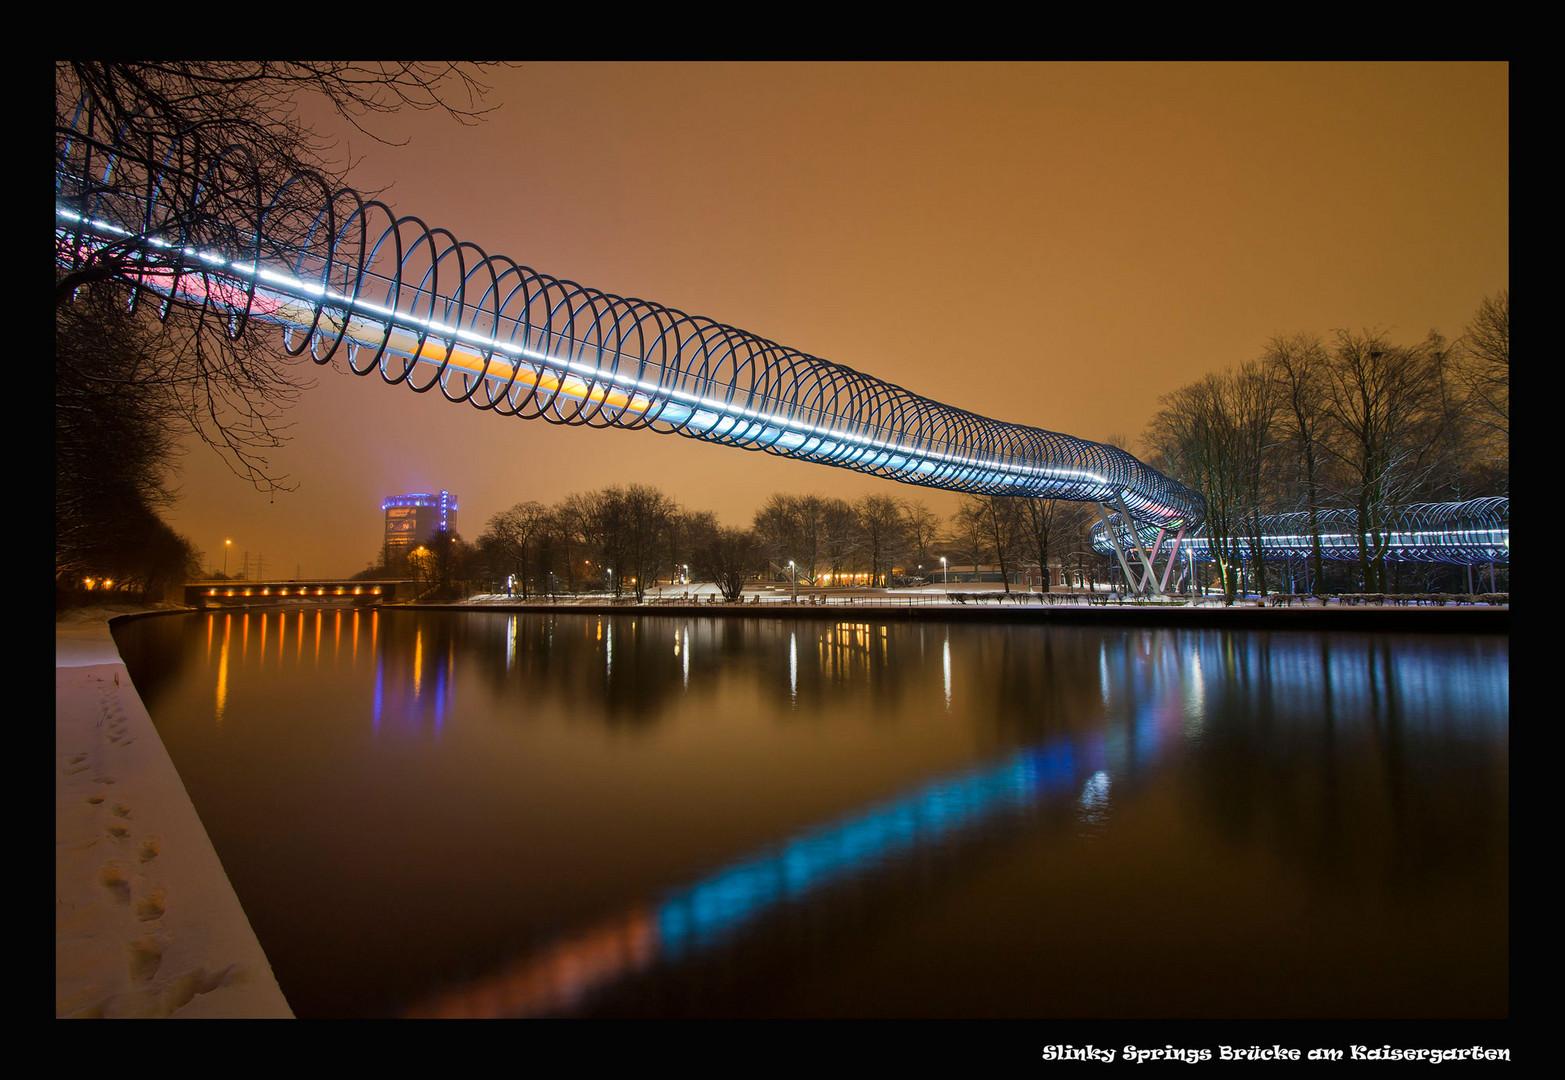 Slinky Springs Brücke am Kaisergarten in Oberhausen